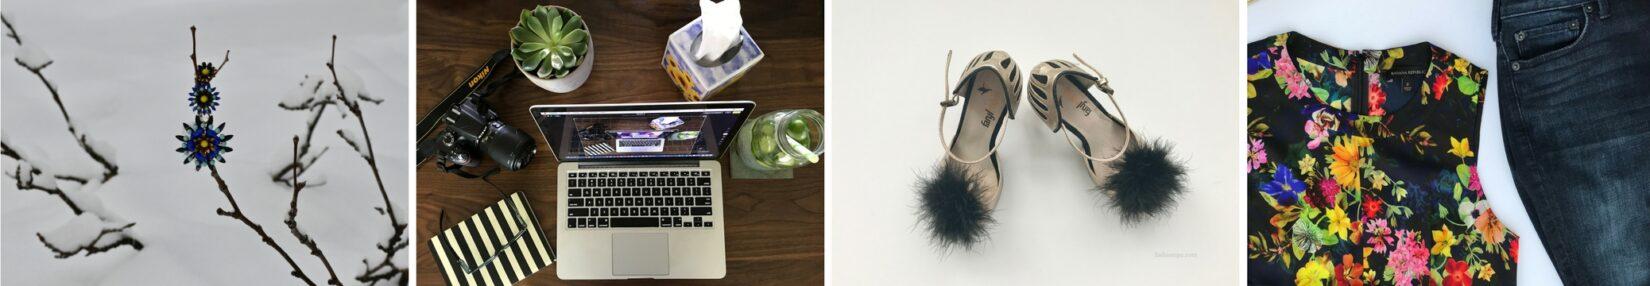 fashionipa.com about me collage